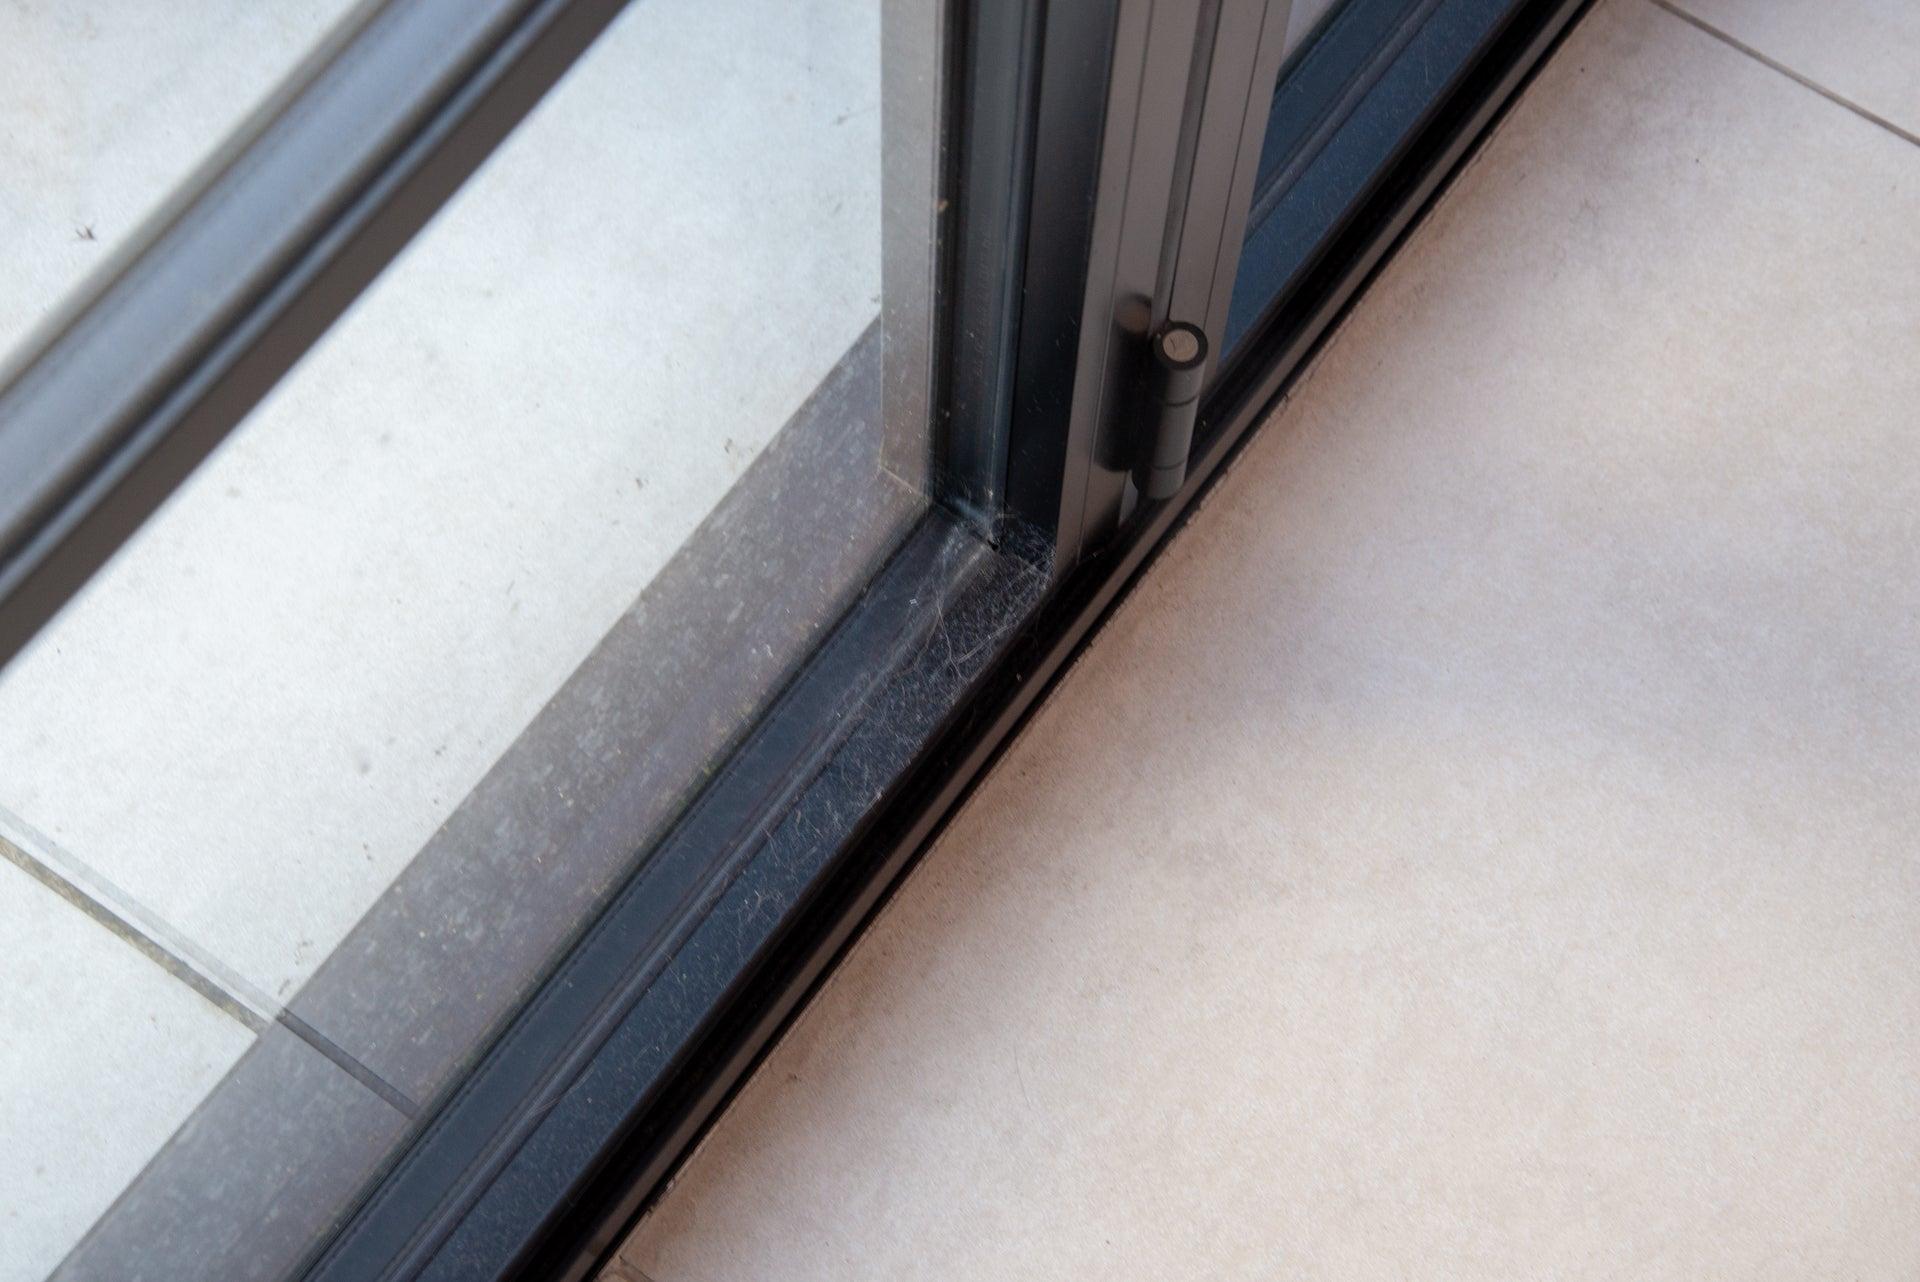 Hoover H-Handy 700 dirty window